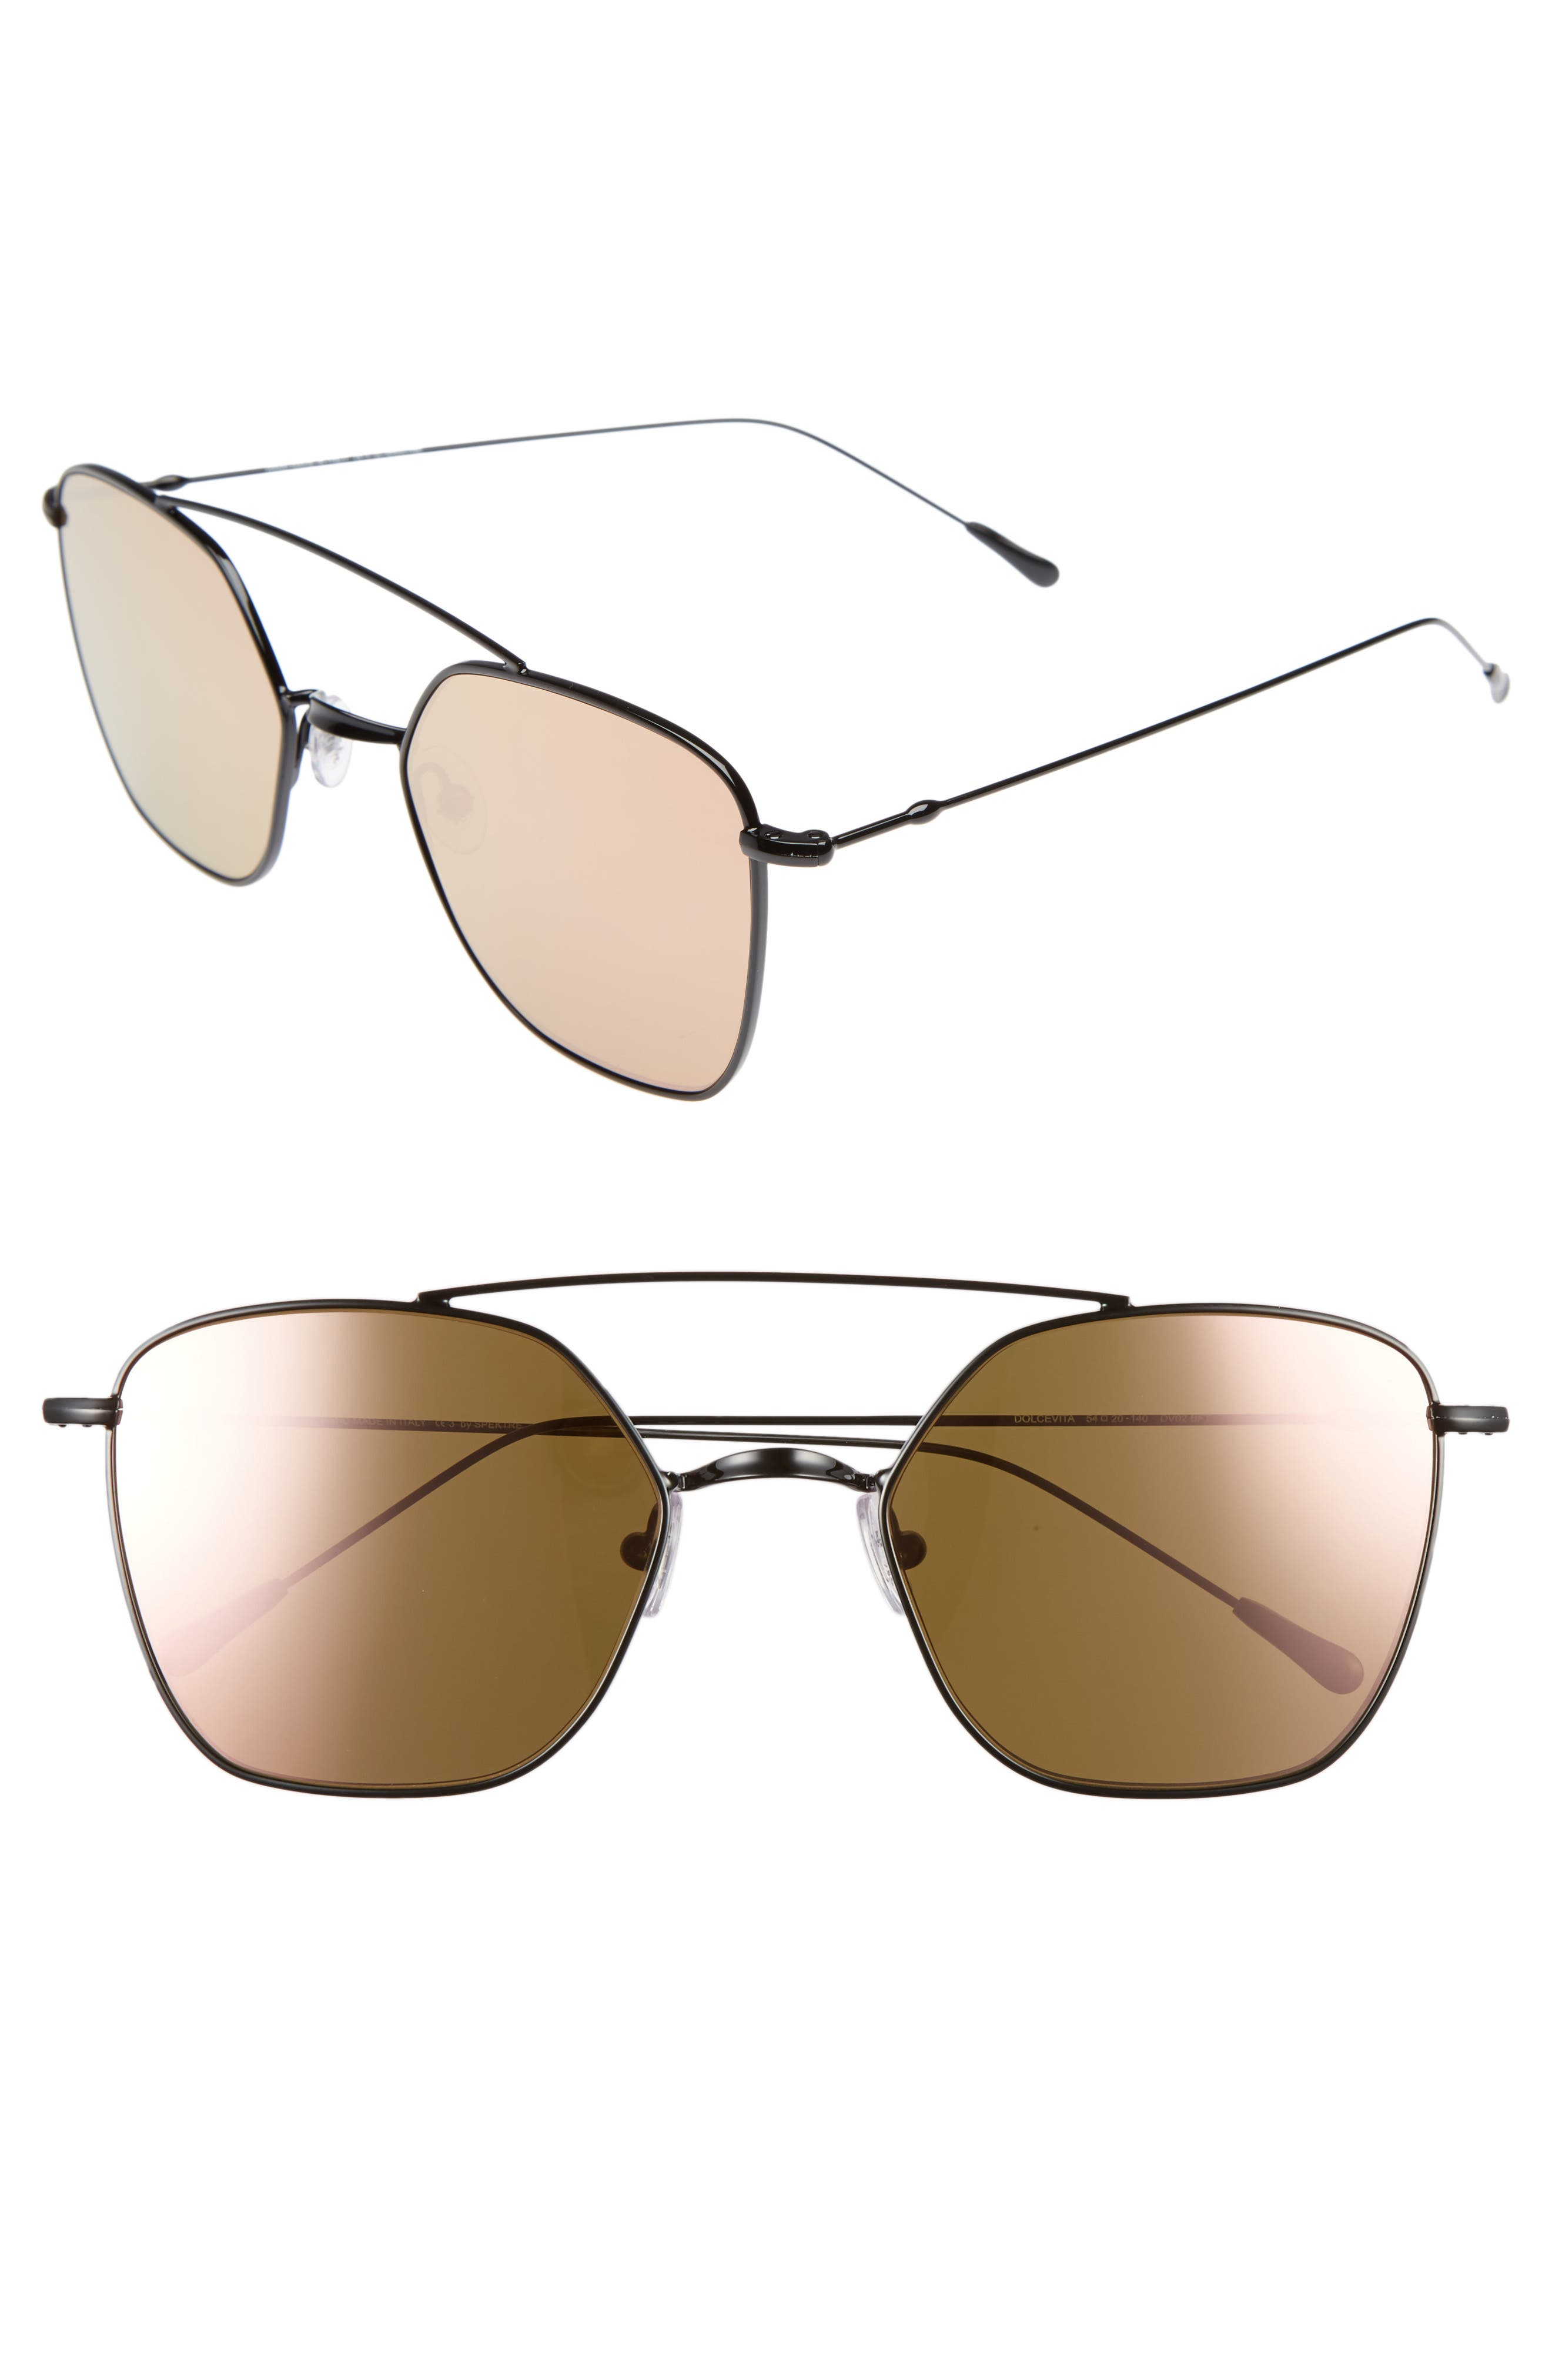 Spektre Dolce Vita 54mm Aviator Sunglasses